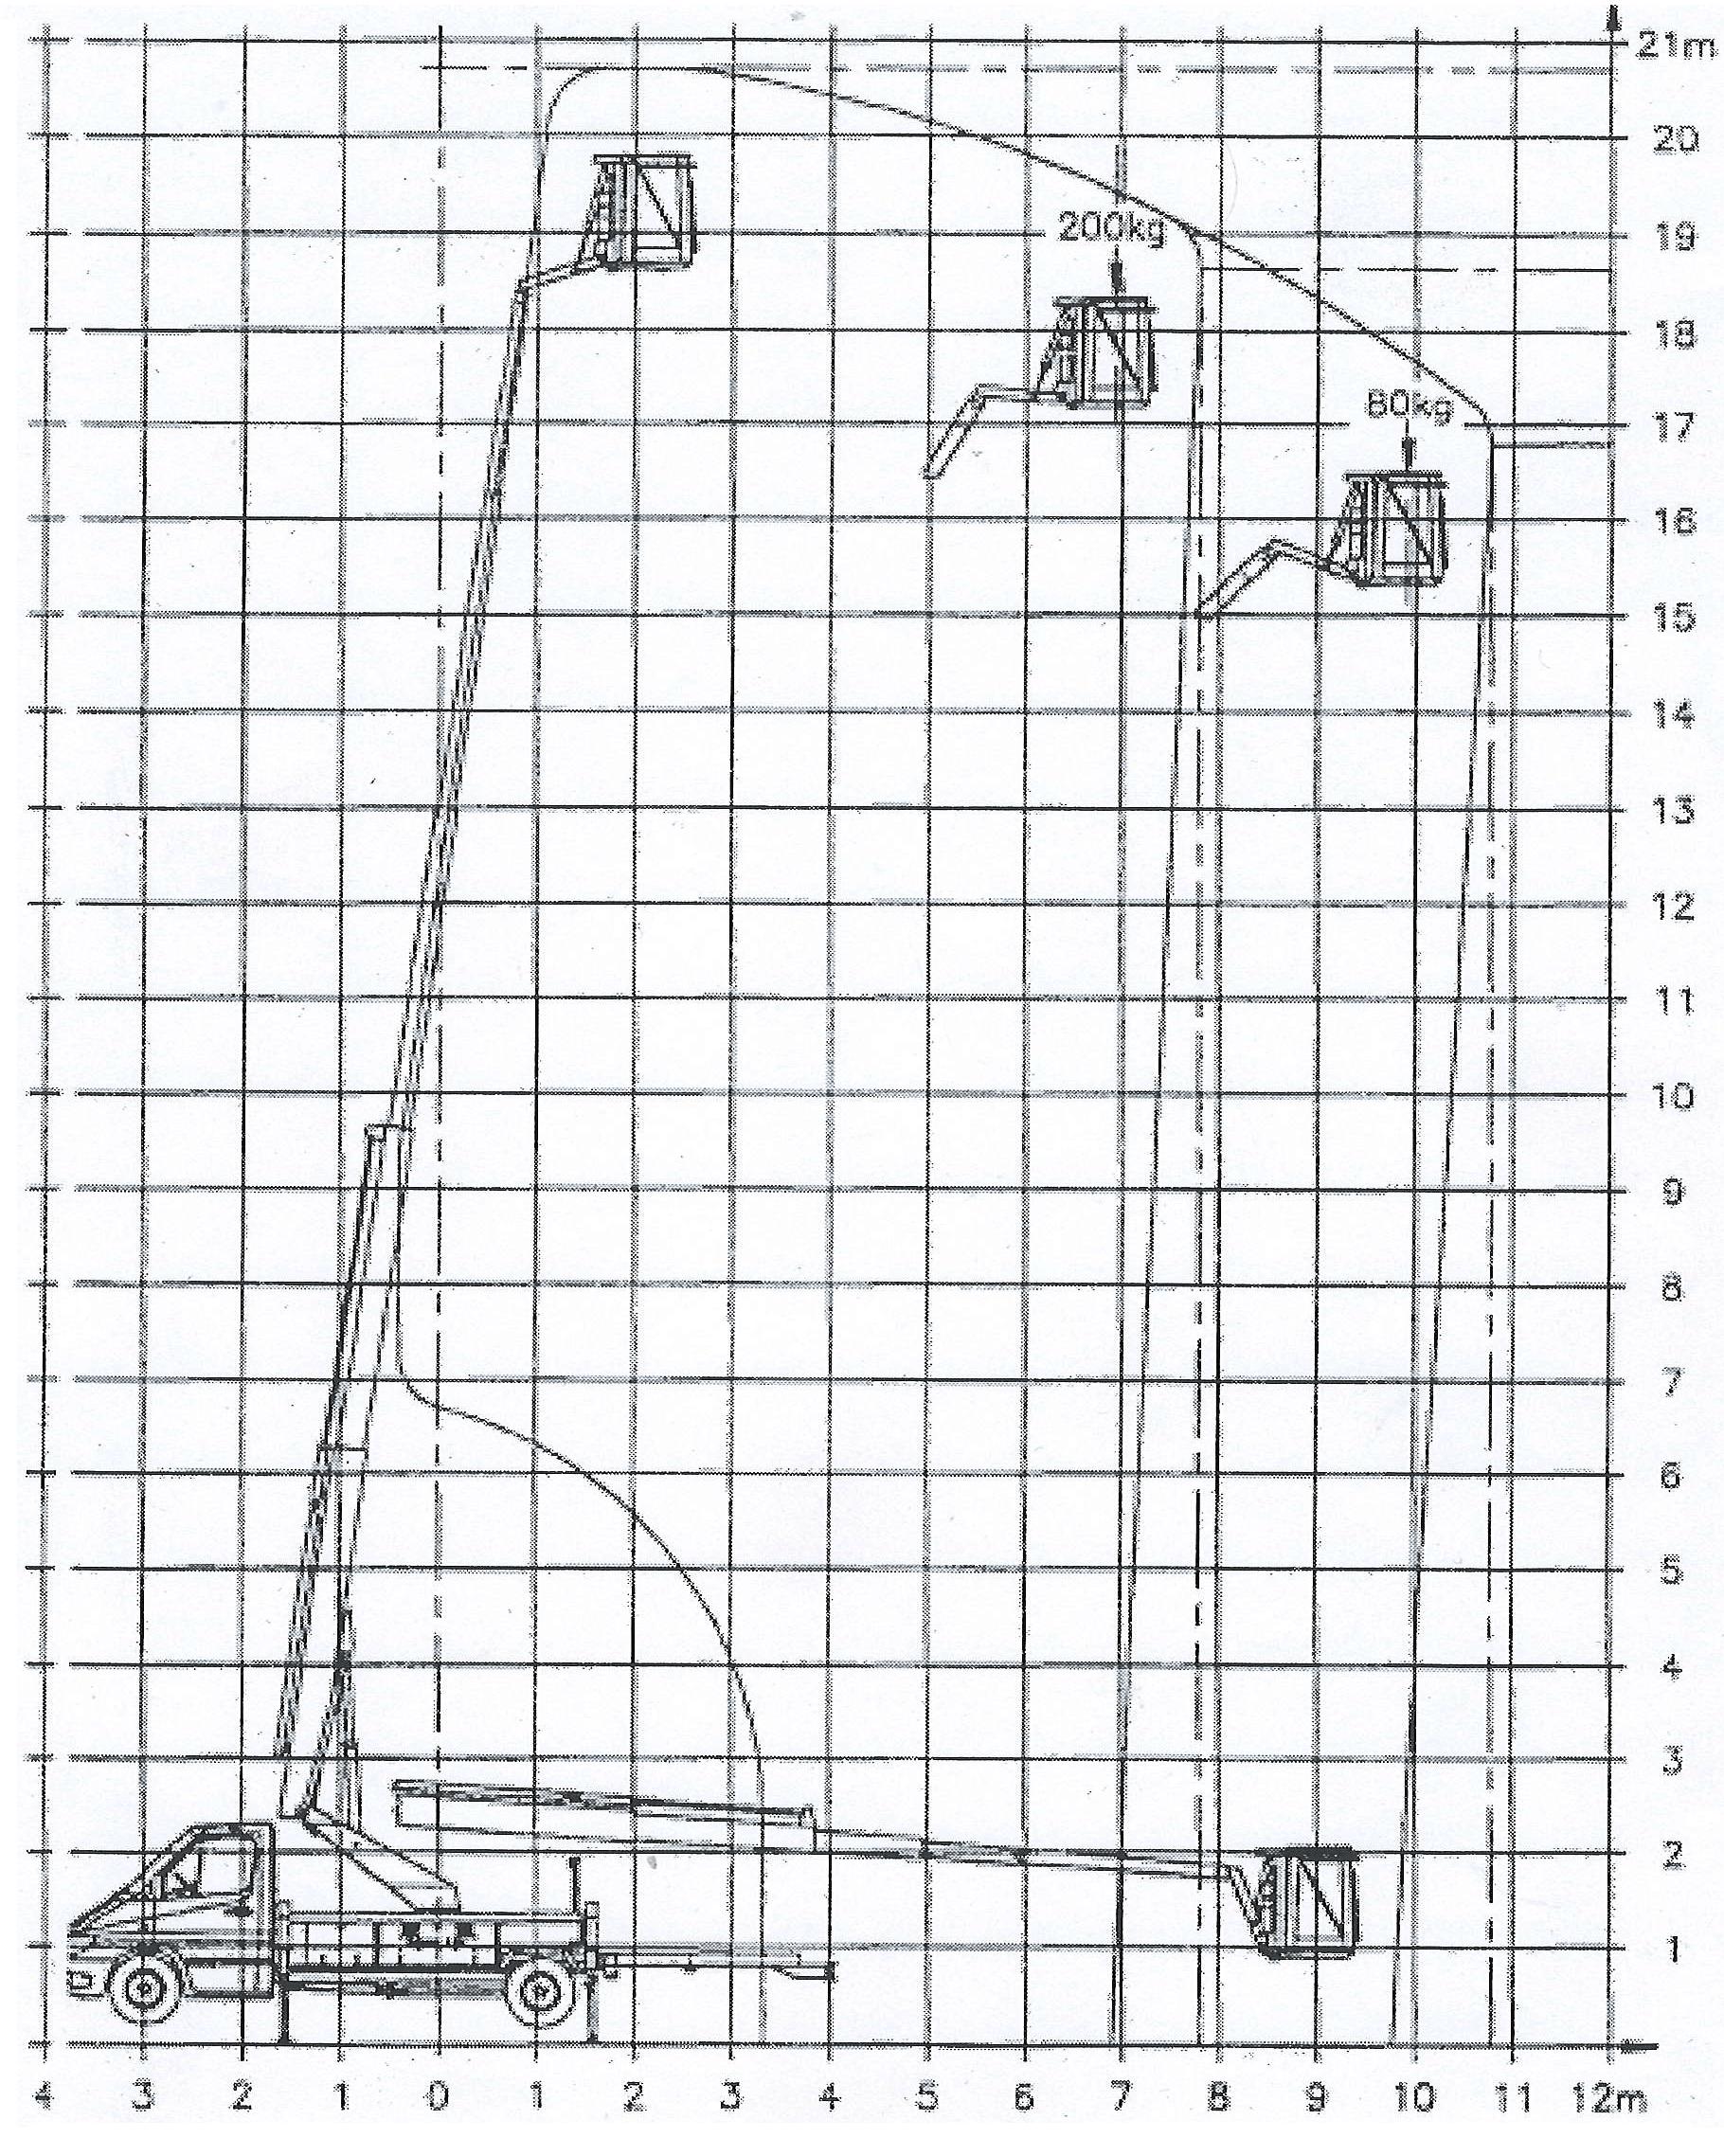 DENKA LIFT DL21T schemat